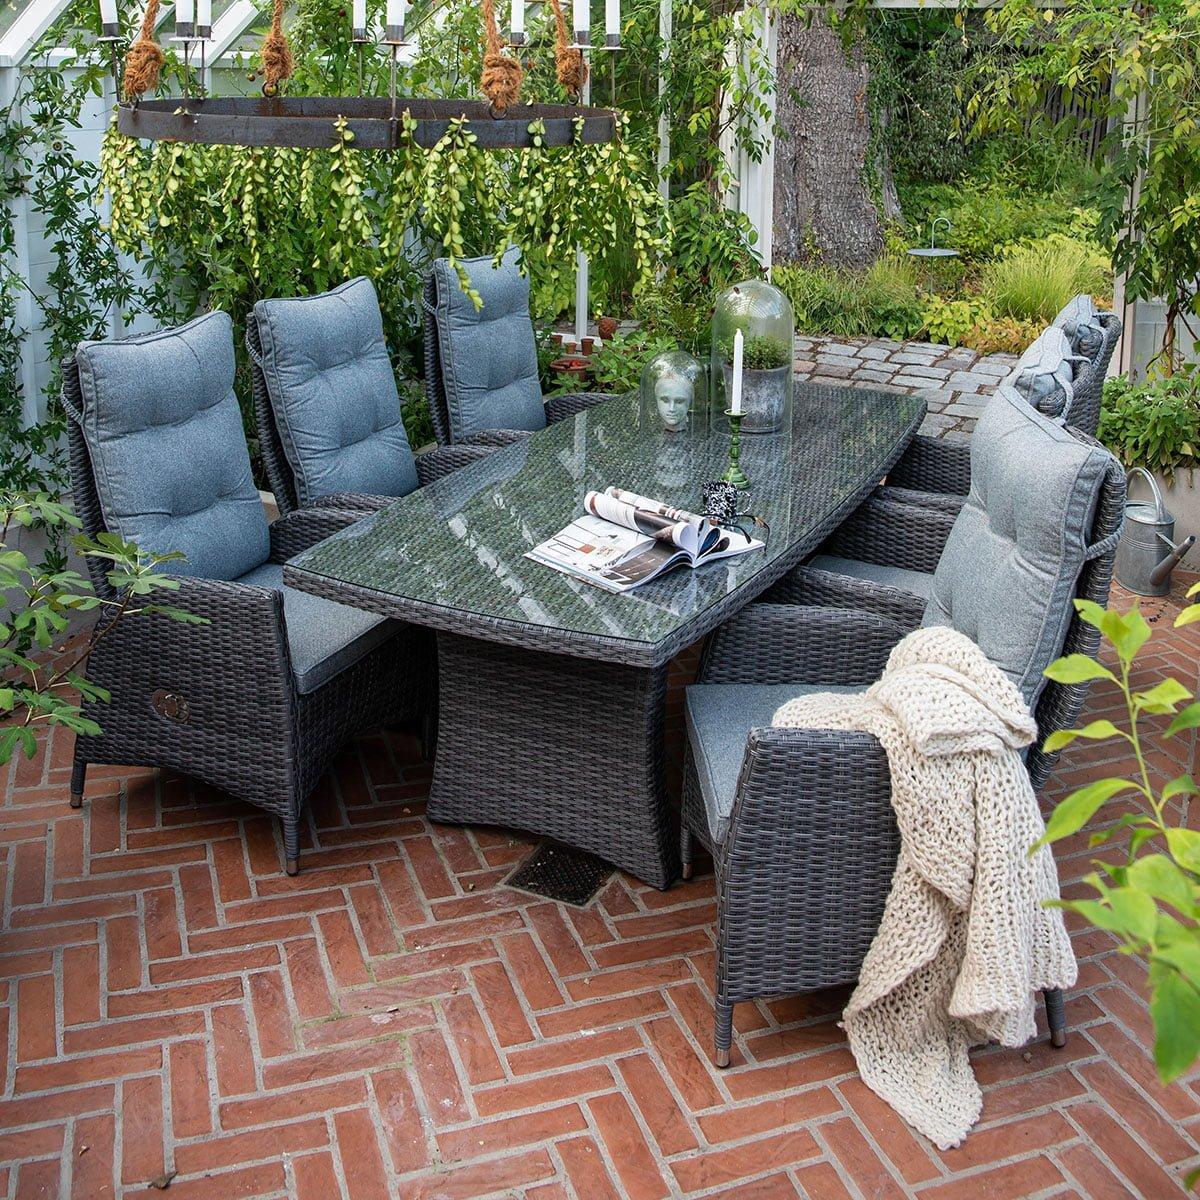 Hagemøbler/utemøbler/rottingmøbler/spisegruppe/sofagruppe/stol